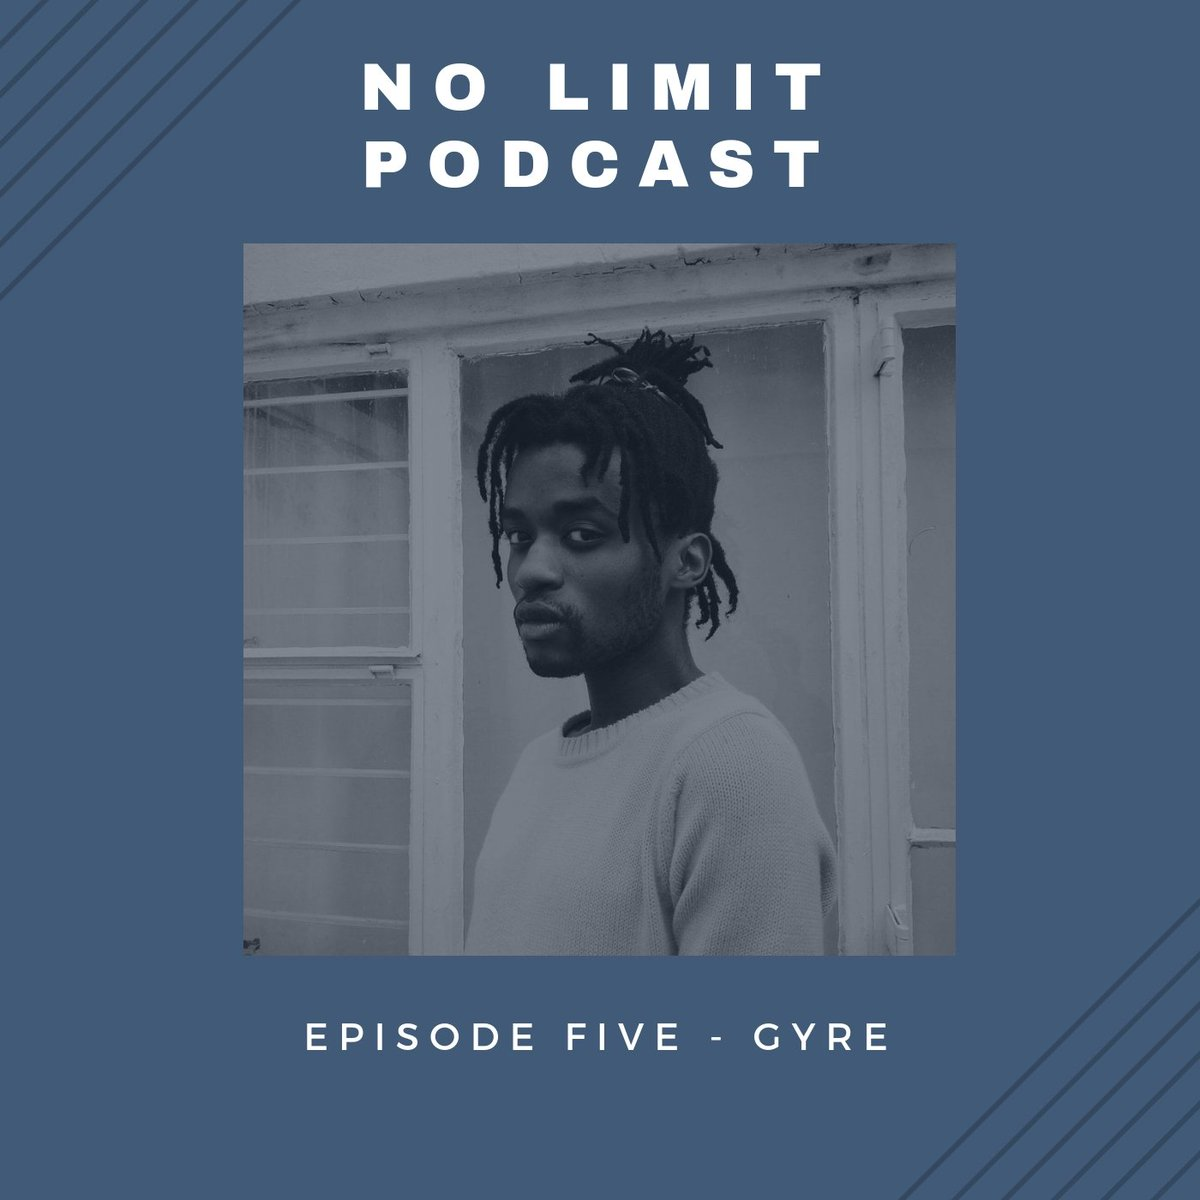 No Limit Podcast (@NoLimitPod) | Twitter